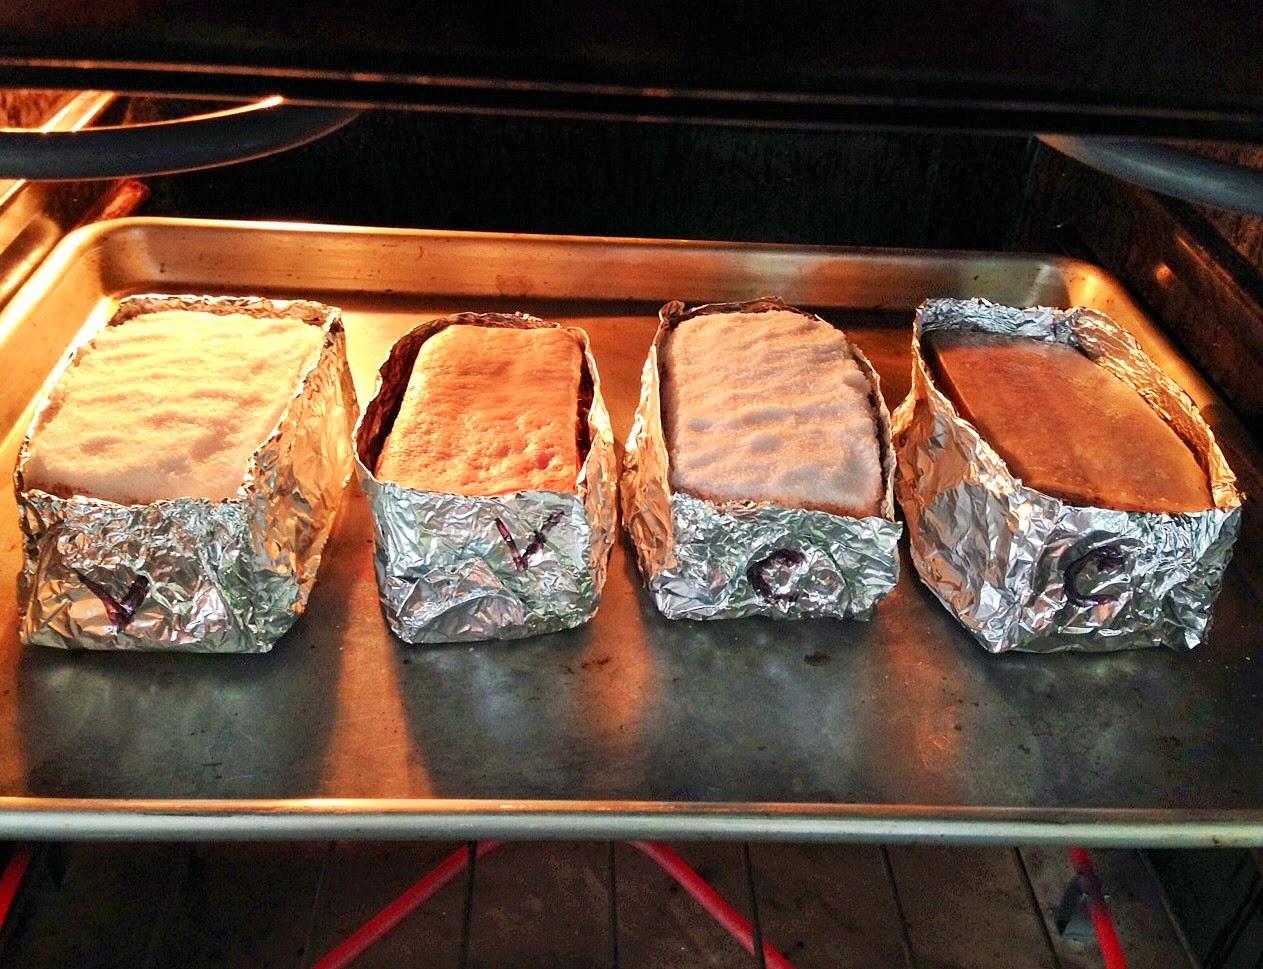 The Spices Of Life      : Thịt Heo Quay (Roast Pork)